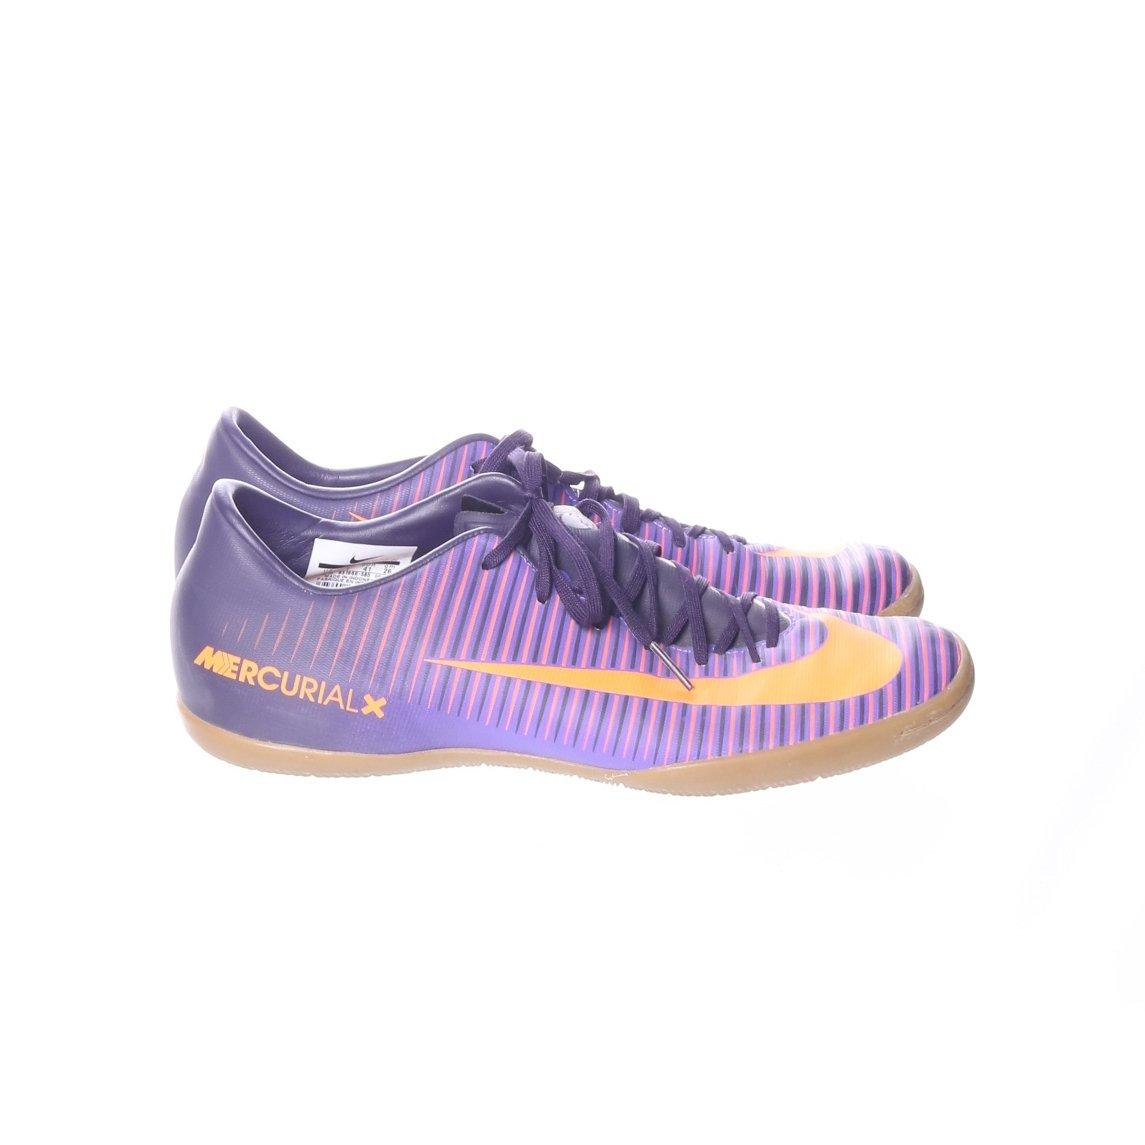 online store 8fdc8 0cdae Nike, Fotbollsskor, Strl  41, Mercurial, Lila Orange